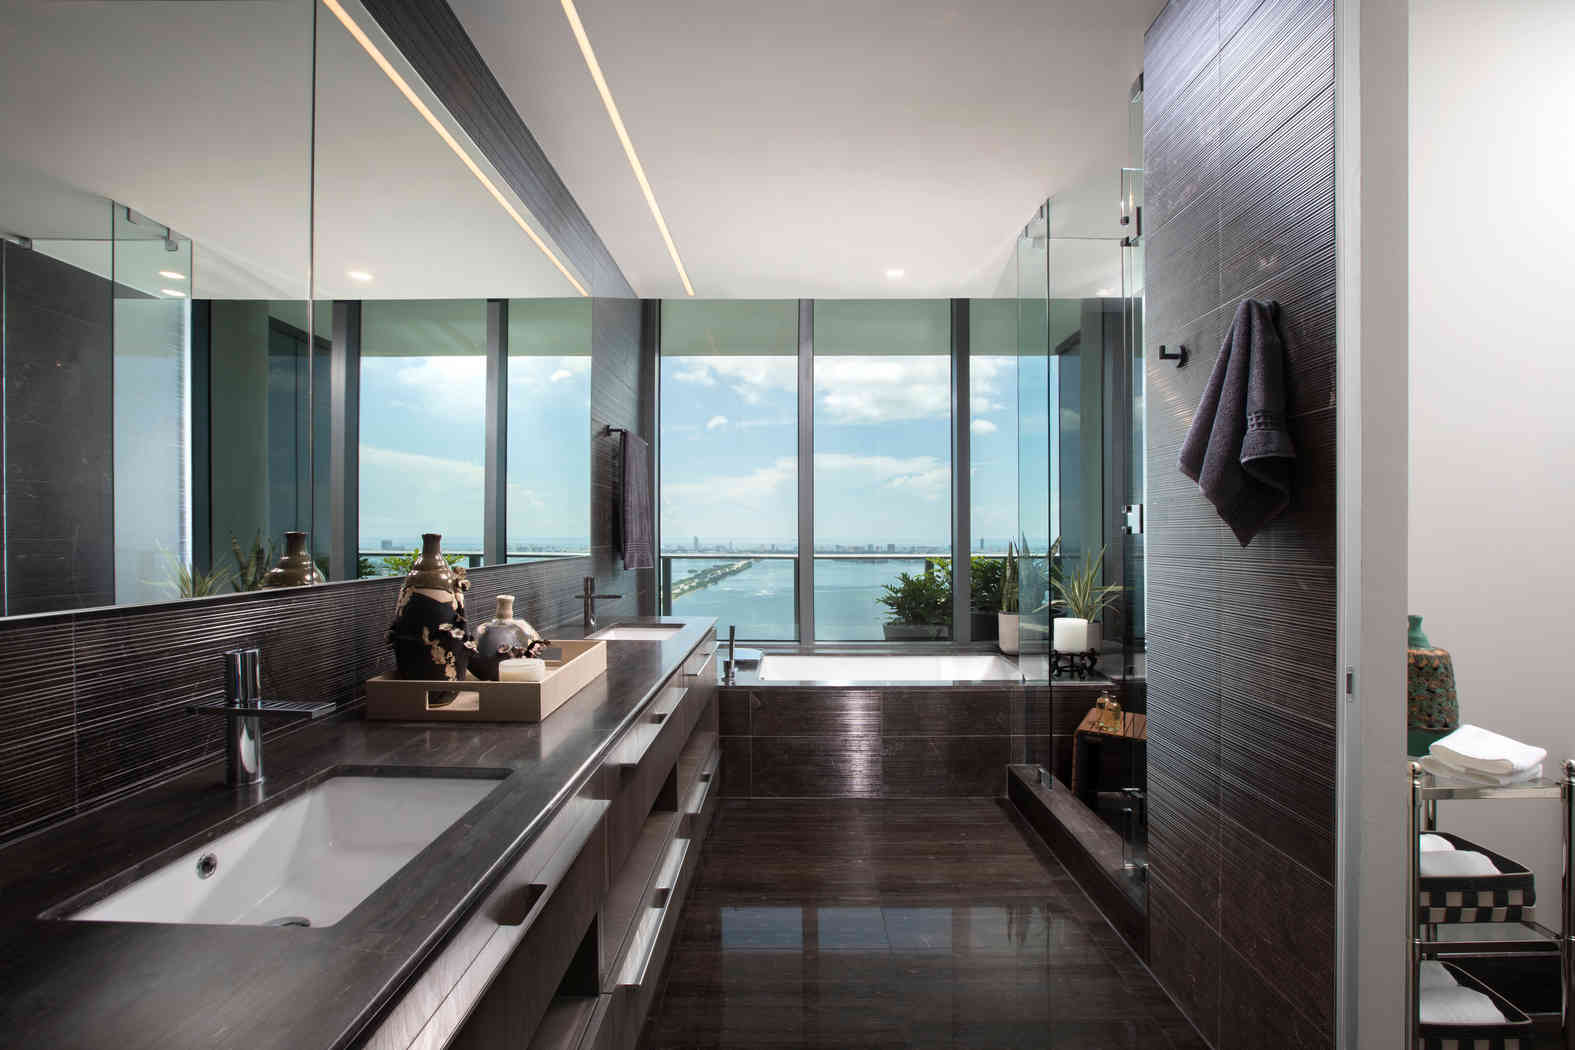 Master Bathroom Ideas Residential Interior Design From Dkor Interiors